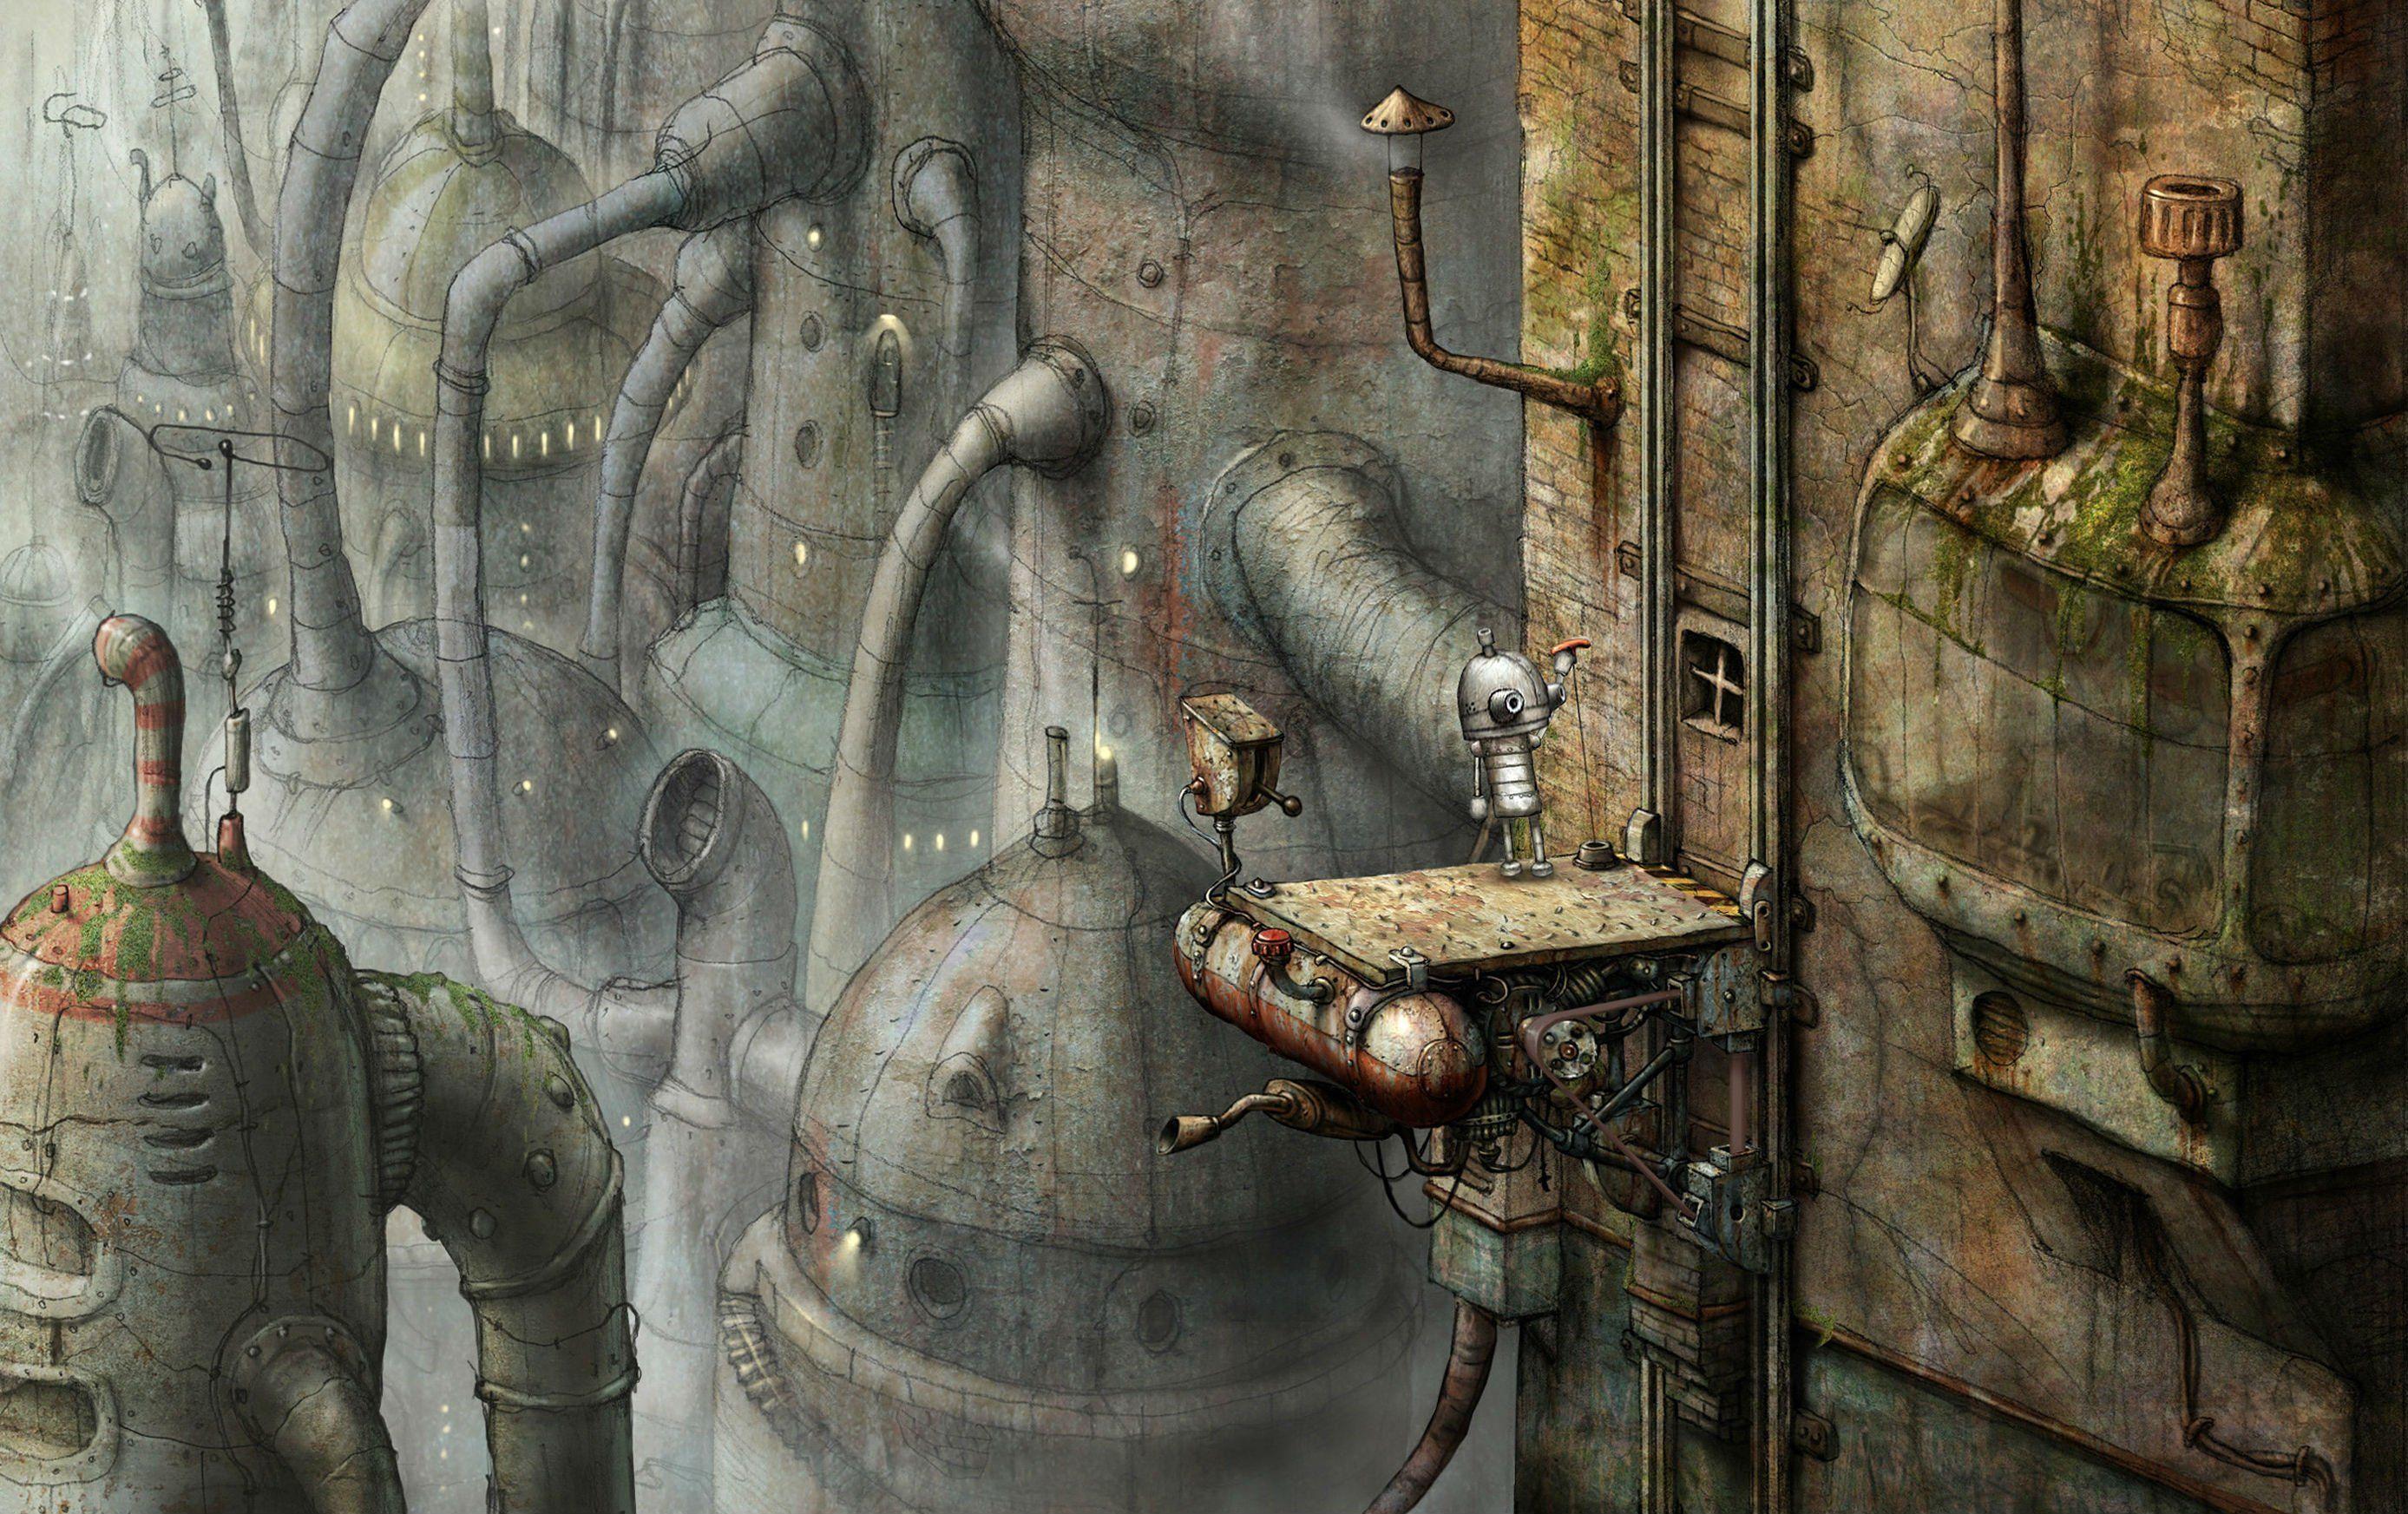 Machinarium Puzzle Point And Click Adventure Sci Fi Robot Steampunk Graphic Family Steampunk Art Steampunk Art